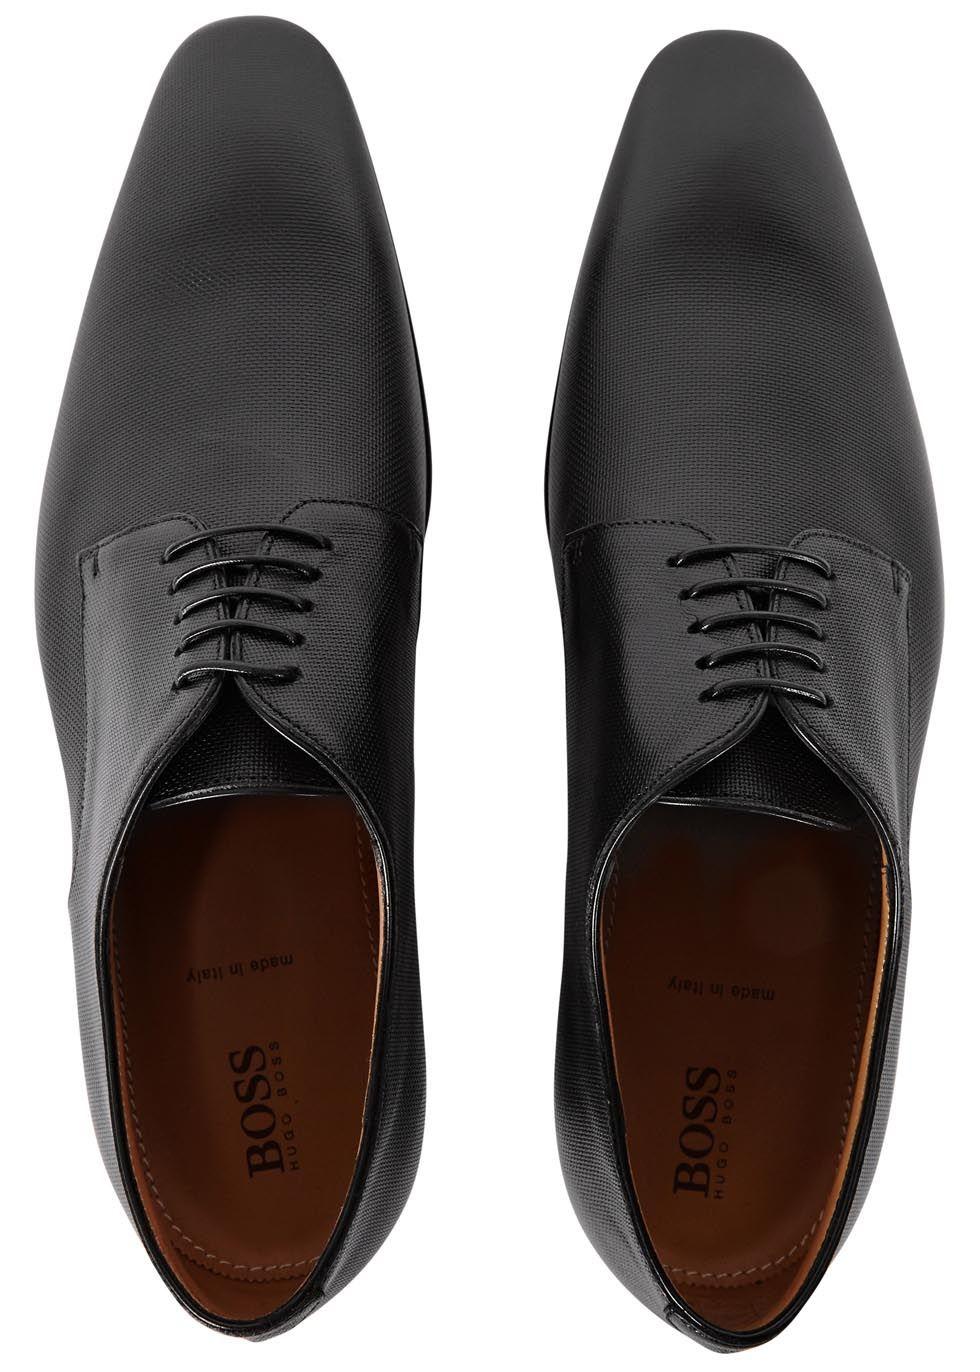 8c1706fddde HUGO BOSS Black textured leather Derby shoes